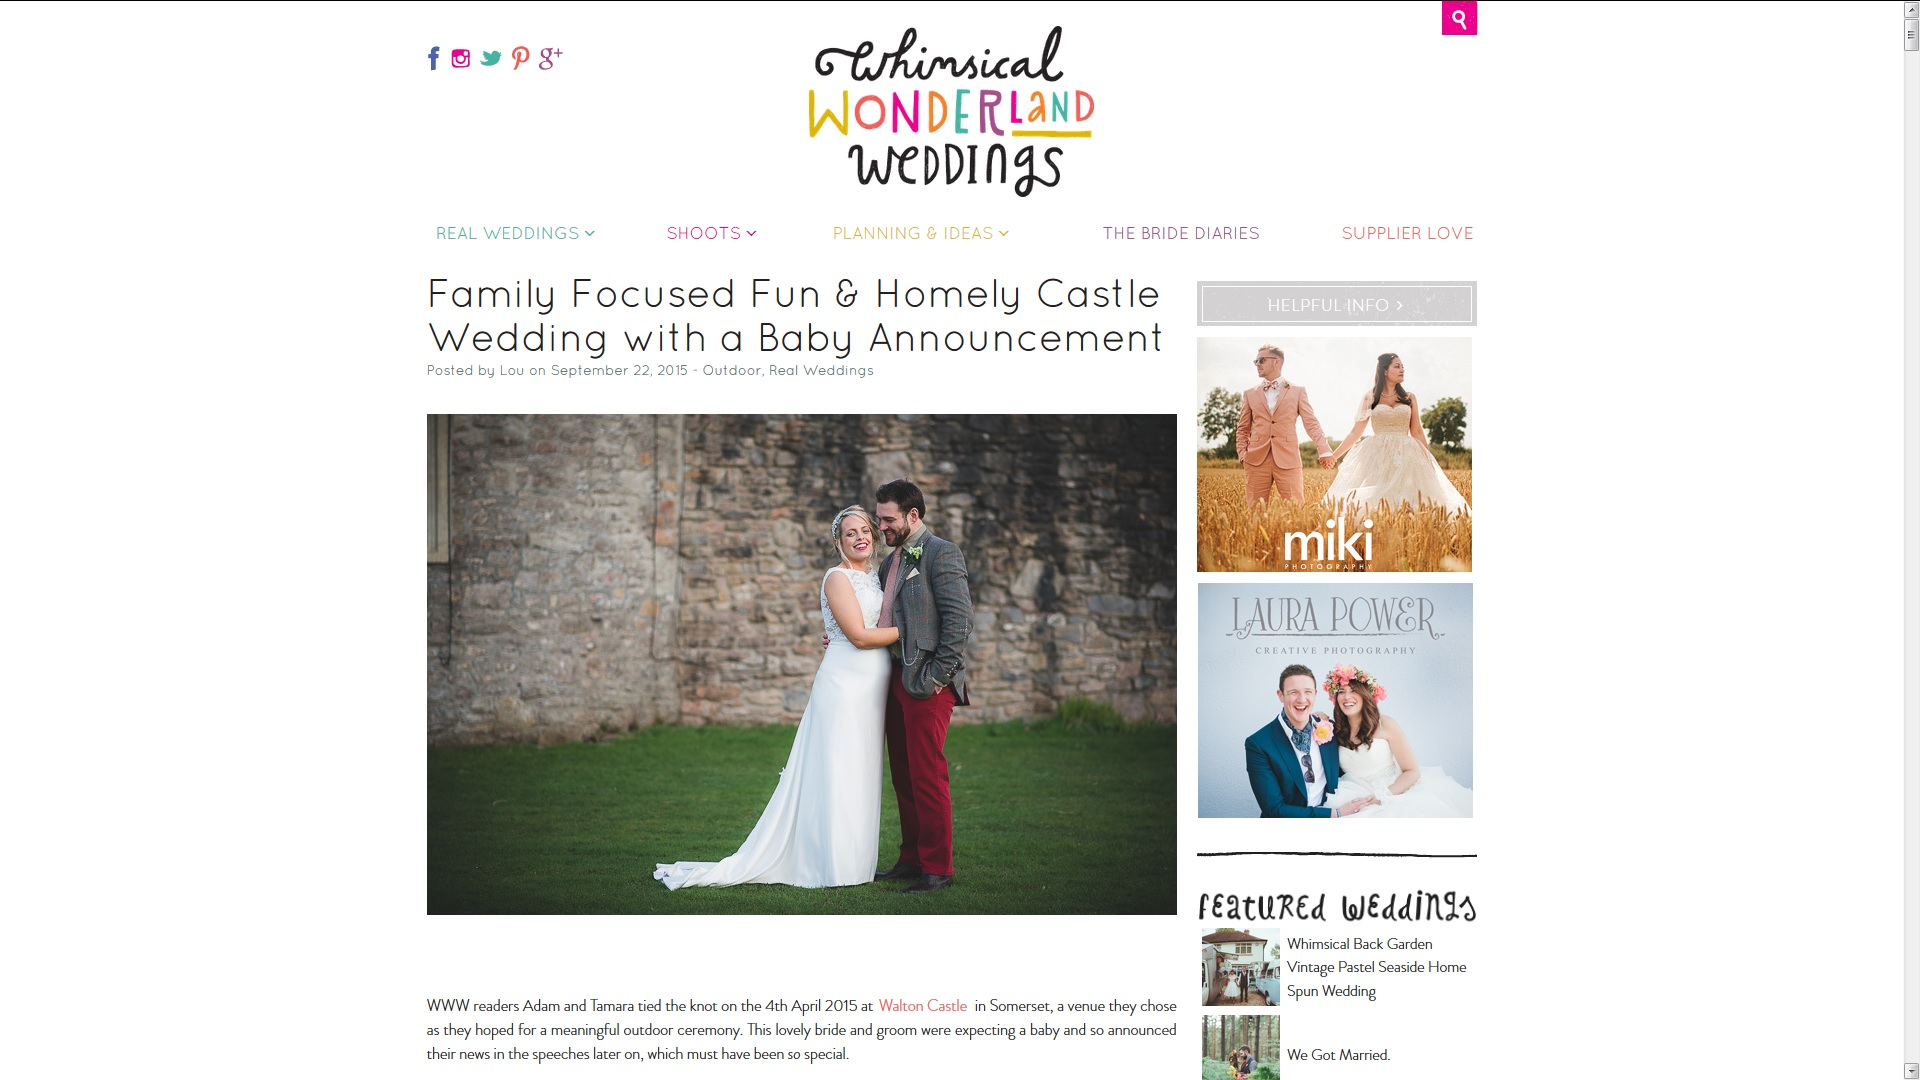 uk-wedding-blog-feature-whimsical-wonderland-weddings